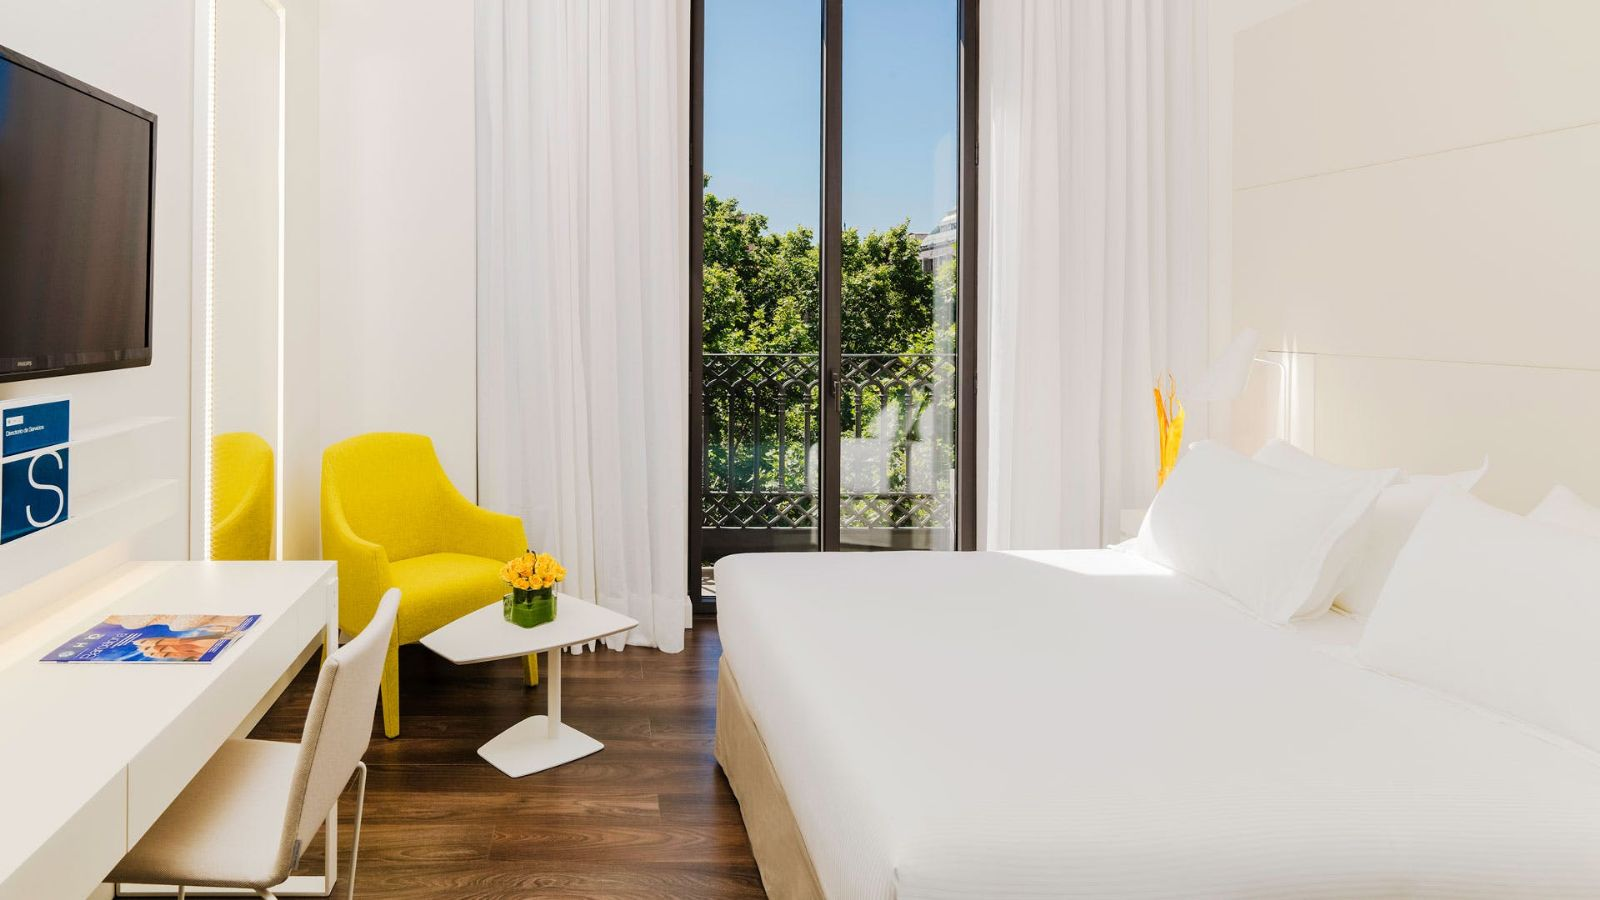 Boutiqe hotel i Barcelona